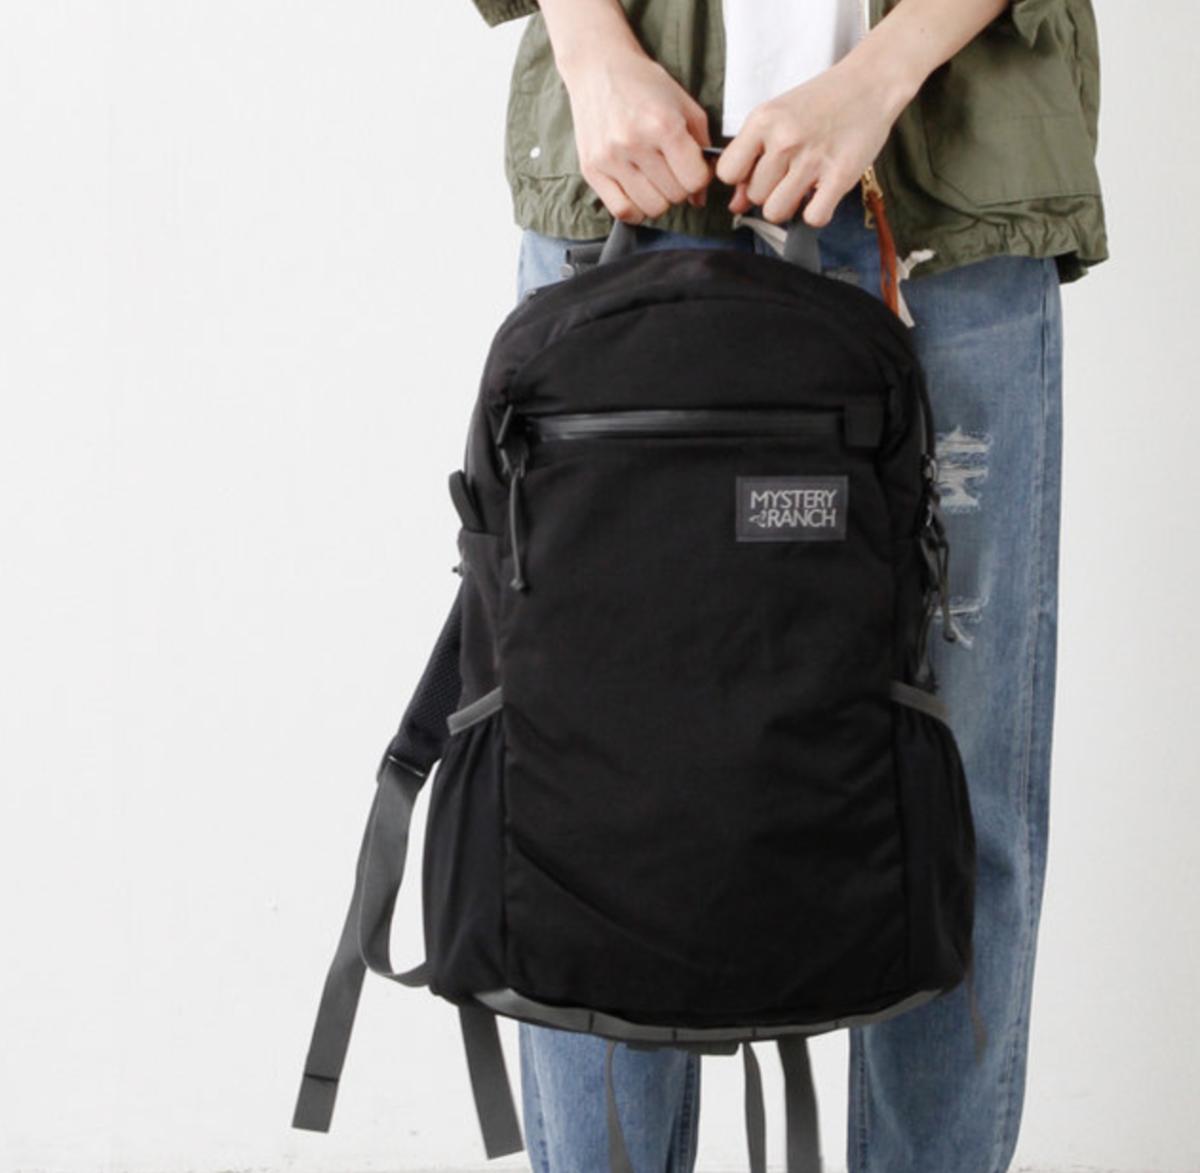 f:id:thebackpack:20190516192402p:plain